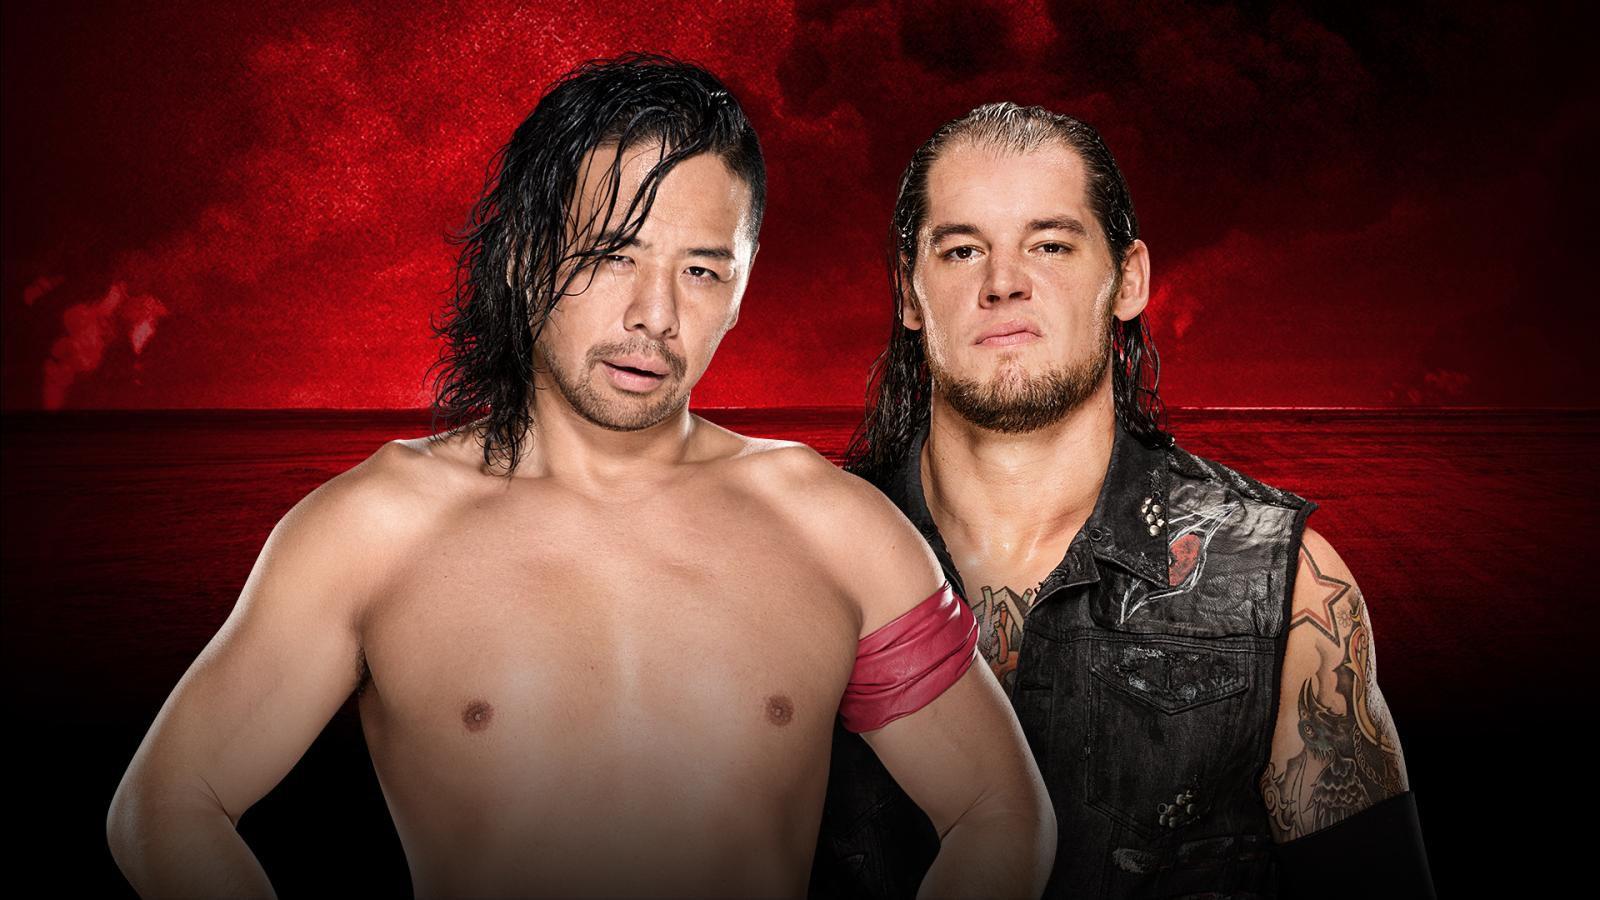 Image result for Shinsuke Nakamura corbin WWE Battleground